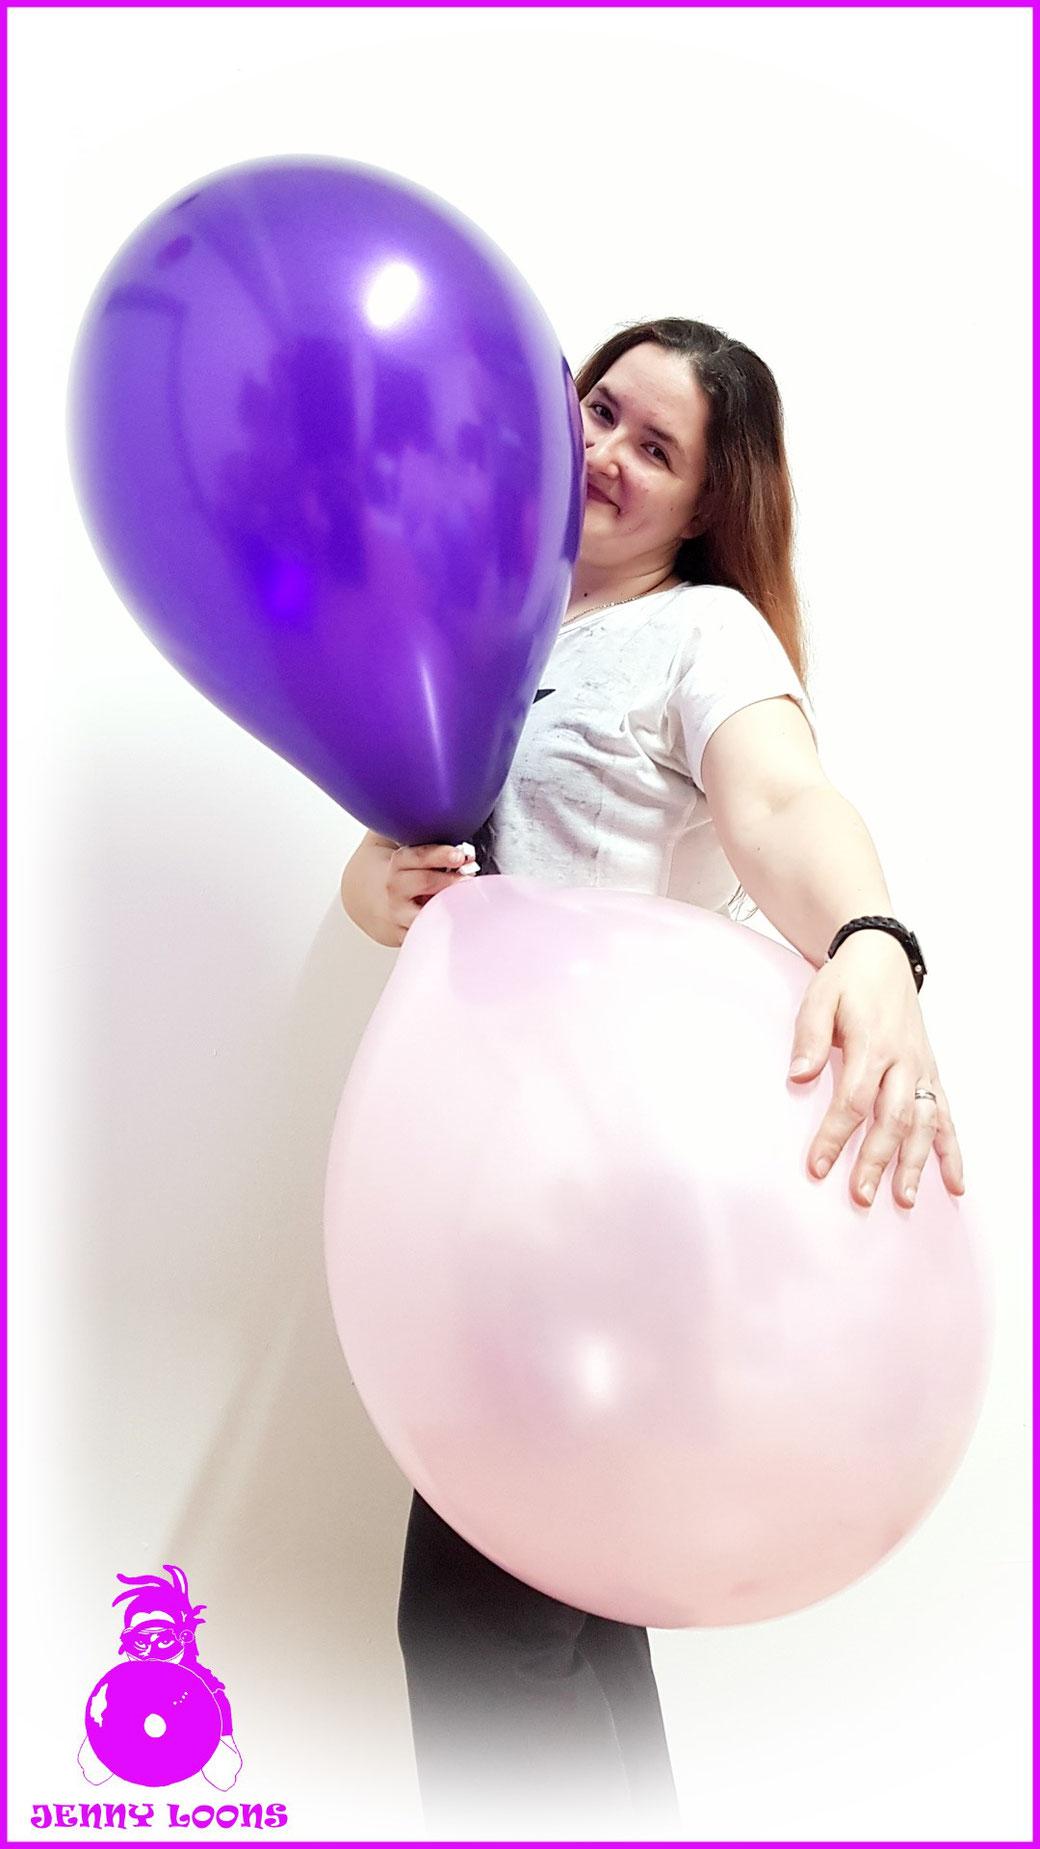 Qualatex Luftballon Ballon Pearl 16inch 40cm rosa rose lila purple Balloon Balloons